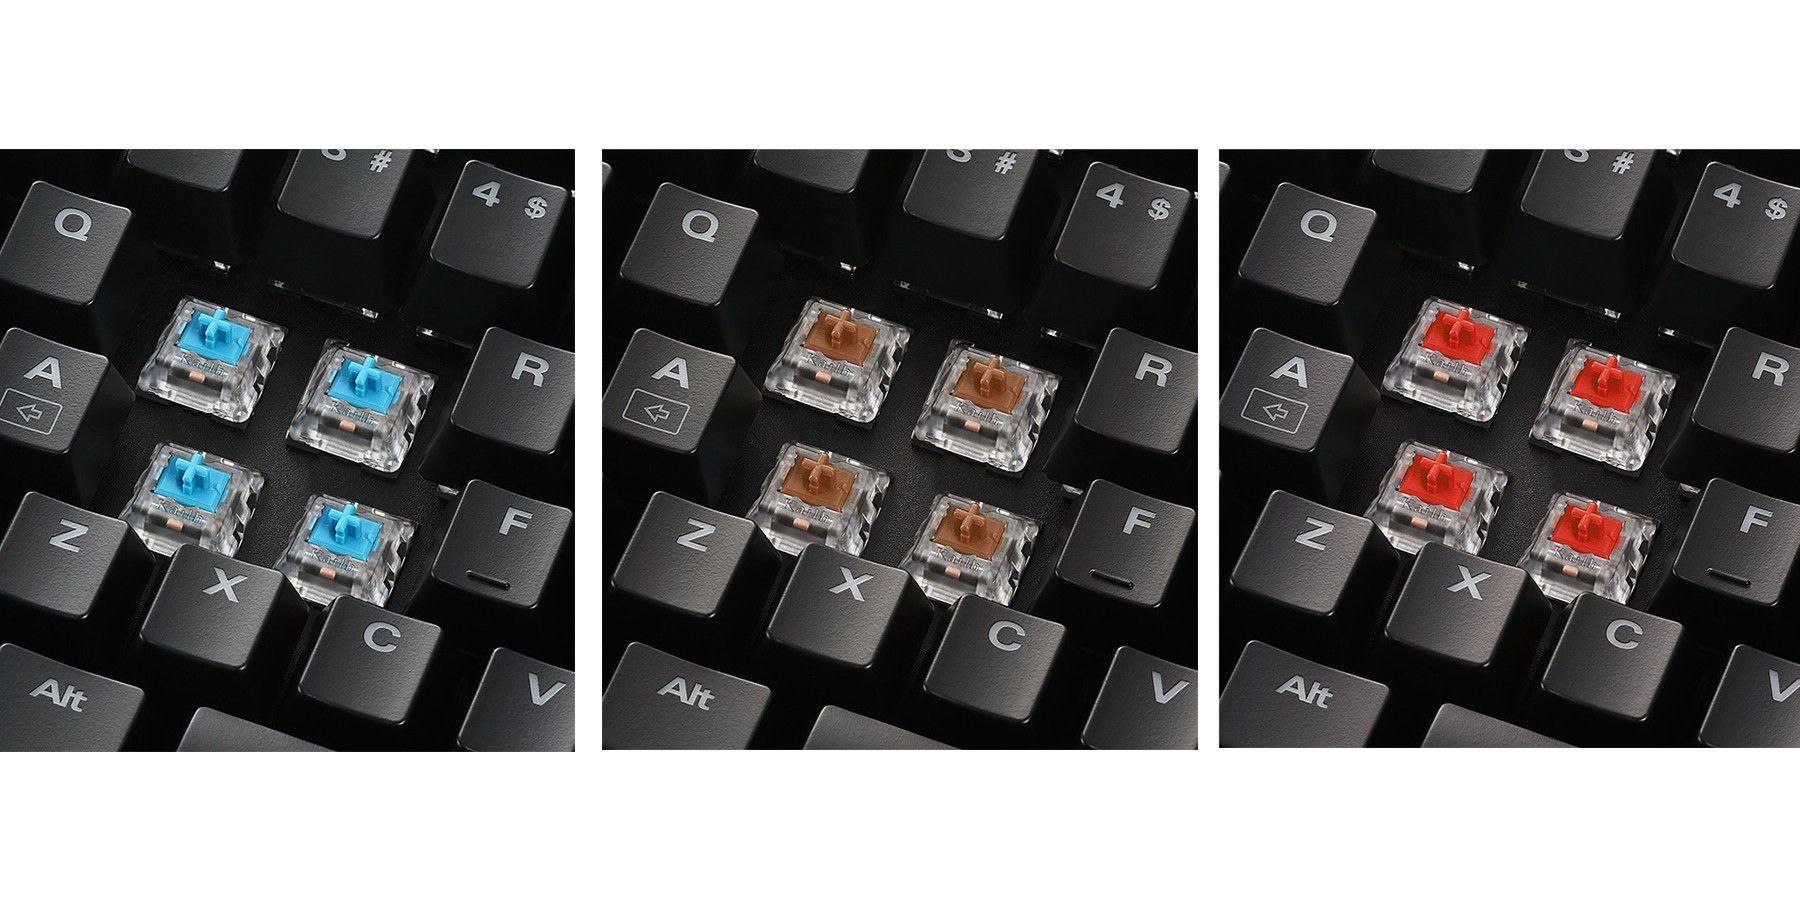 sharkoon skiller sgk3 im praxis test preiswerte gaming tastatur f r einsteiger pc welt. Black Bedroom Furniture Sets. Home Design Ideas